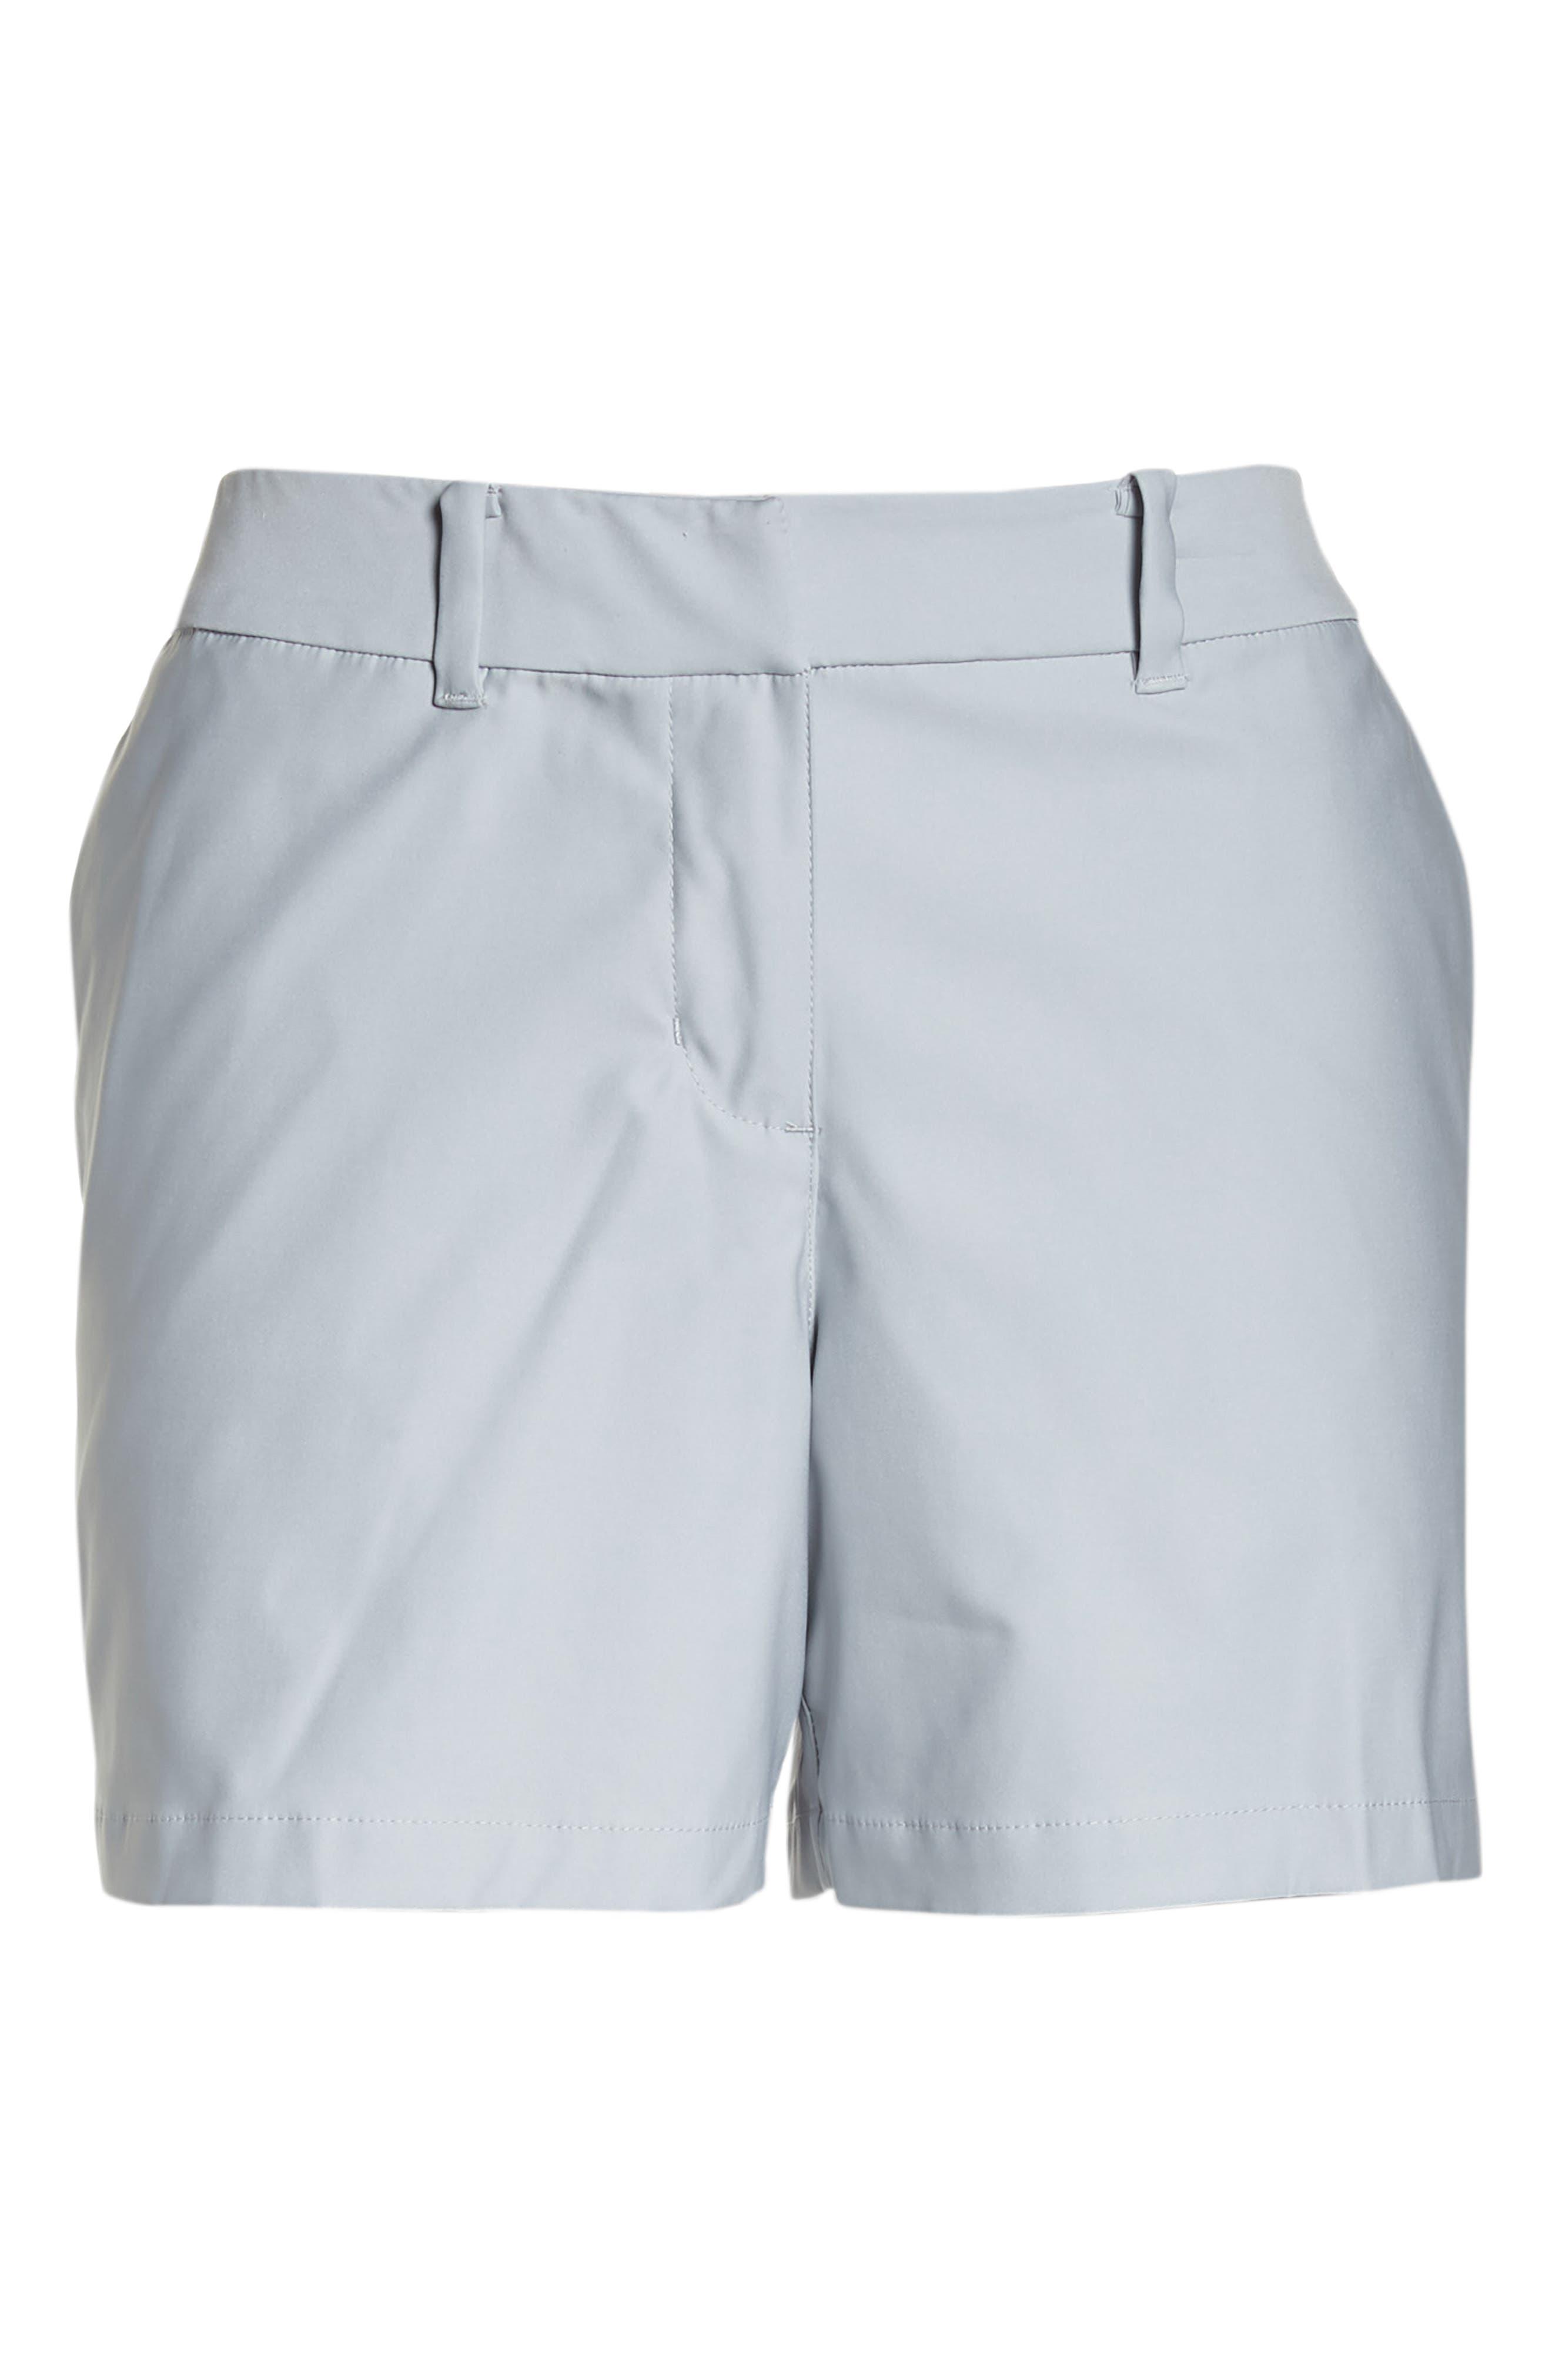 Flex Golf Shorts,                             Main thumbnail 1, color,                             Wolf Grey/ Wolf Grey